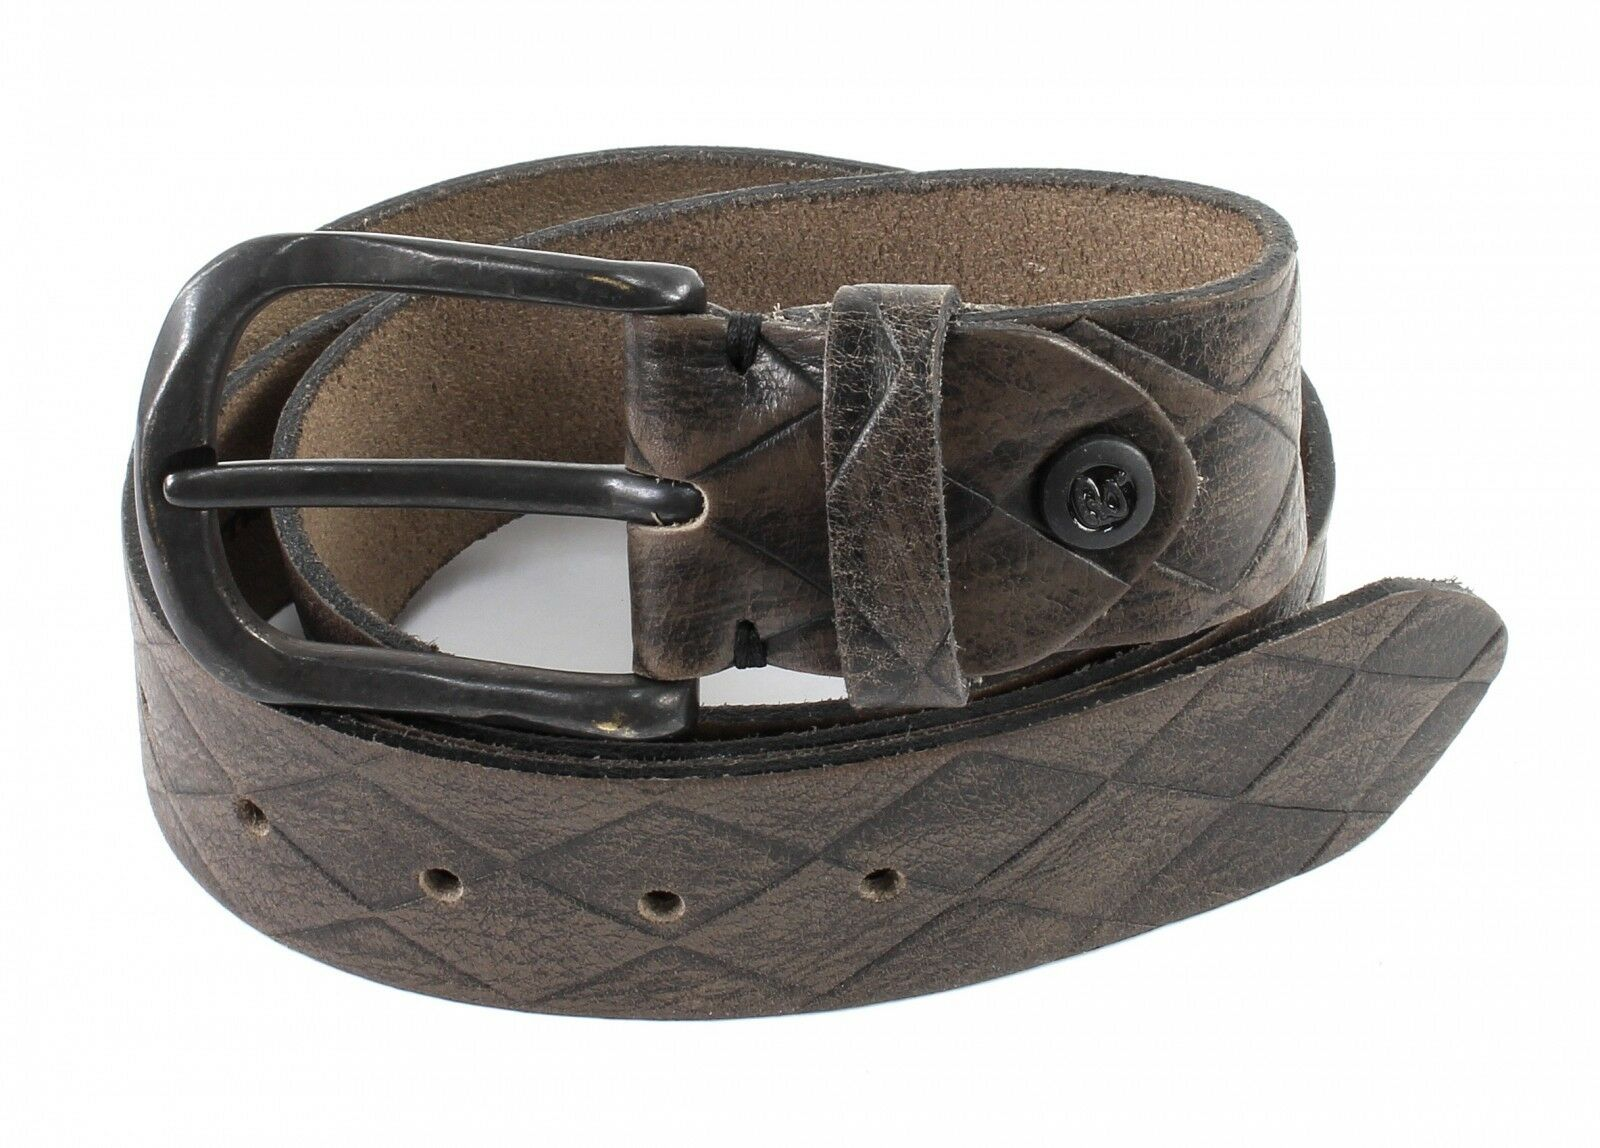 B.belt Ledergürtel W110 Gürtel Accessoire Grau Taupe - Anthrazit Anthrazit Anthrazit Grau Braun Grau 5cd07d